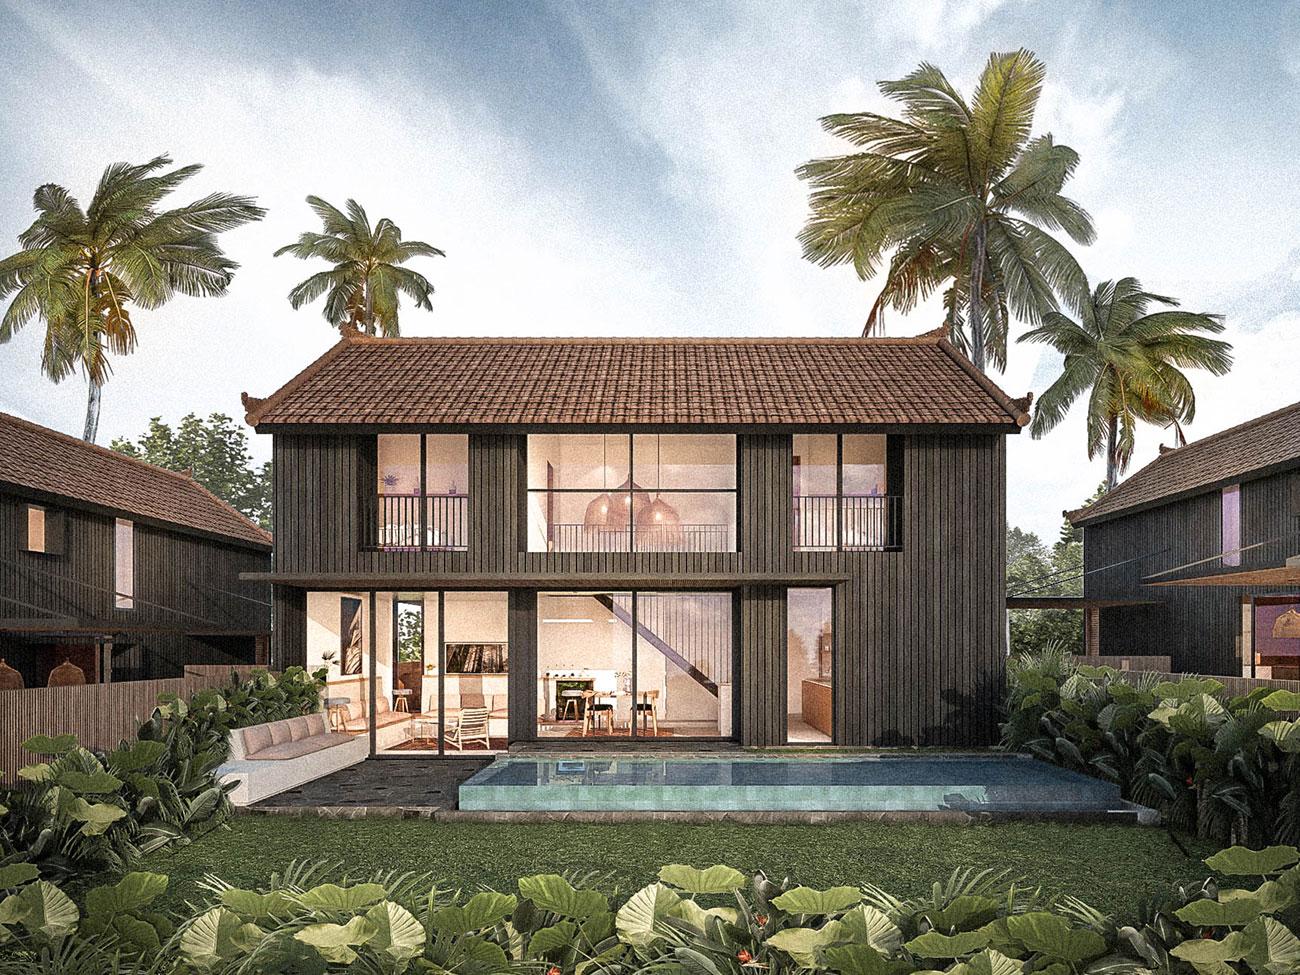 House-B-exterior-2